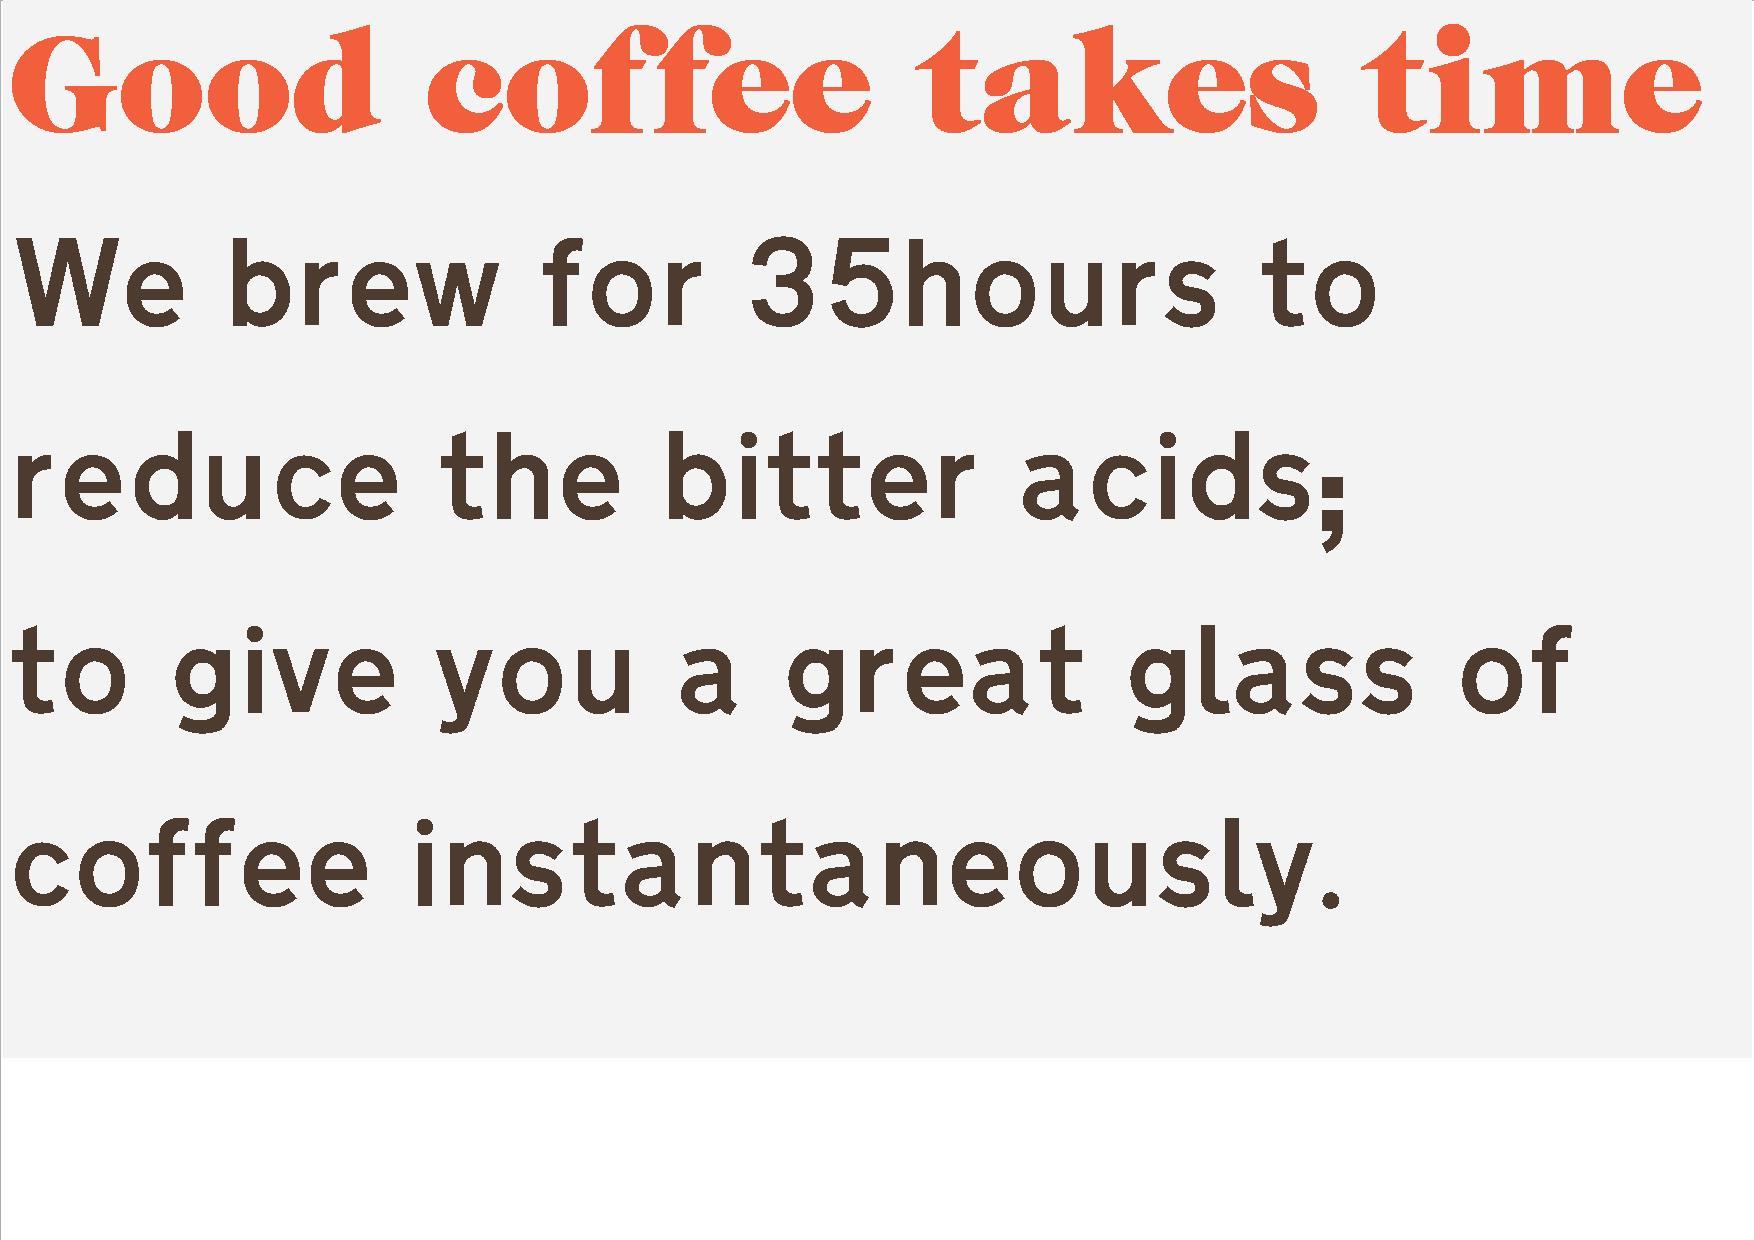 Good coffee takes time 2.jpg